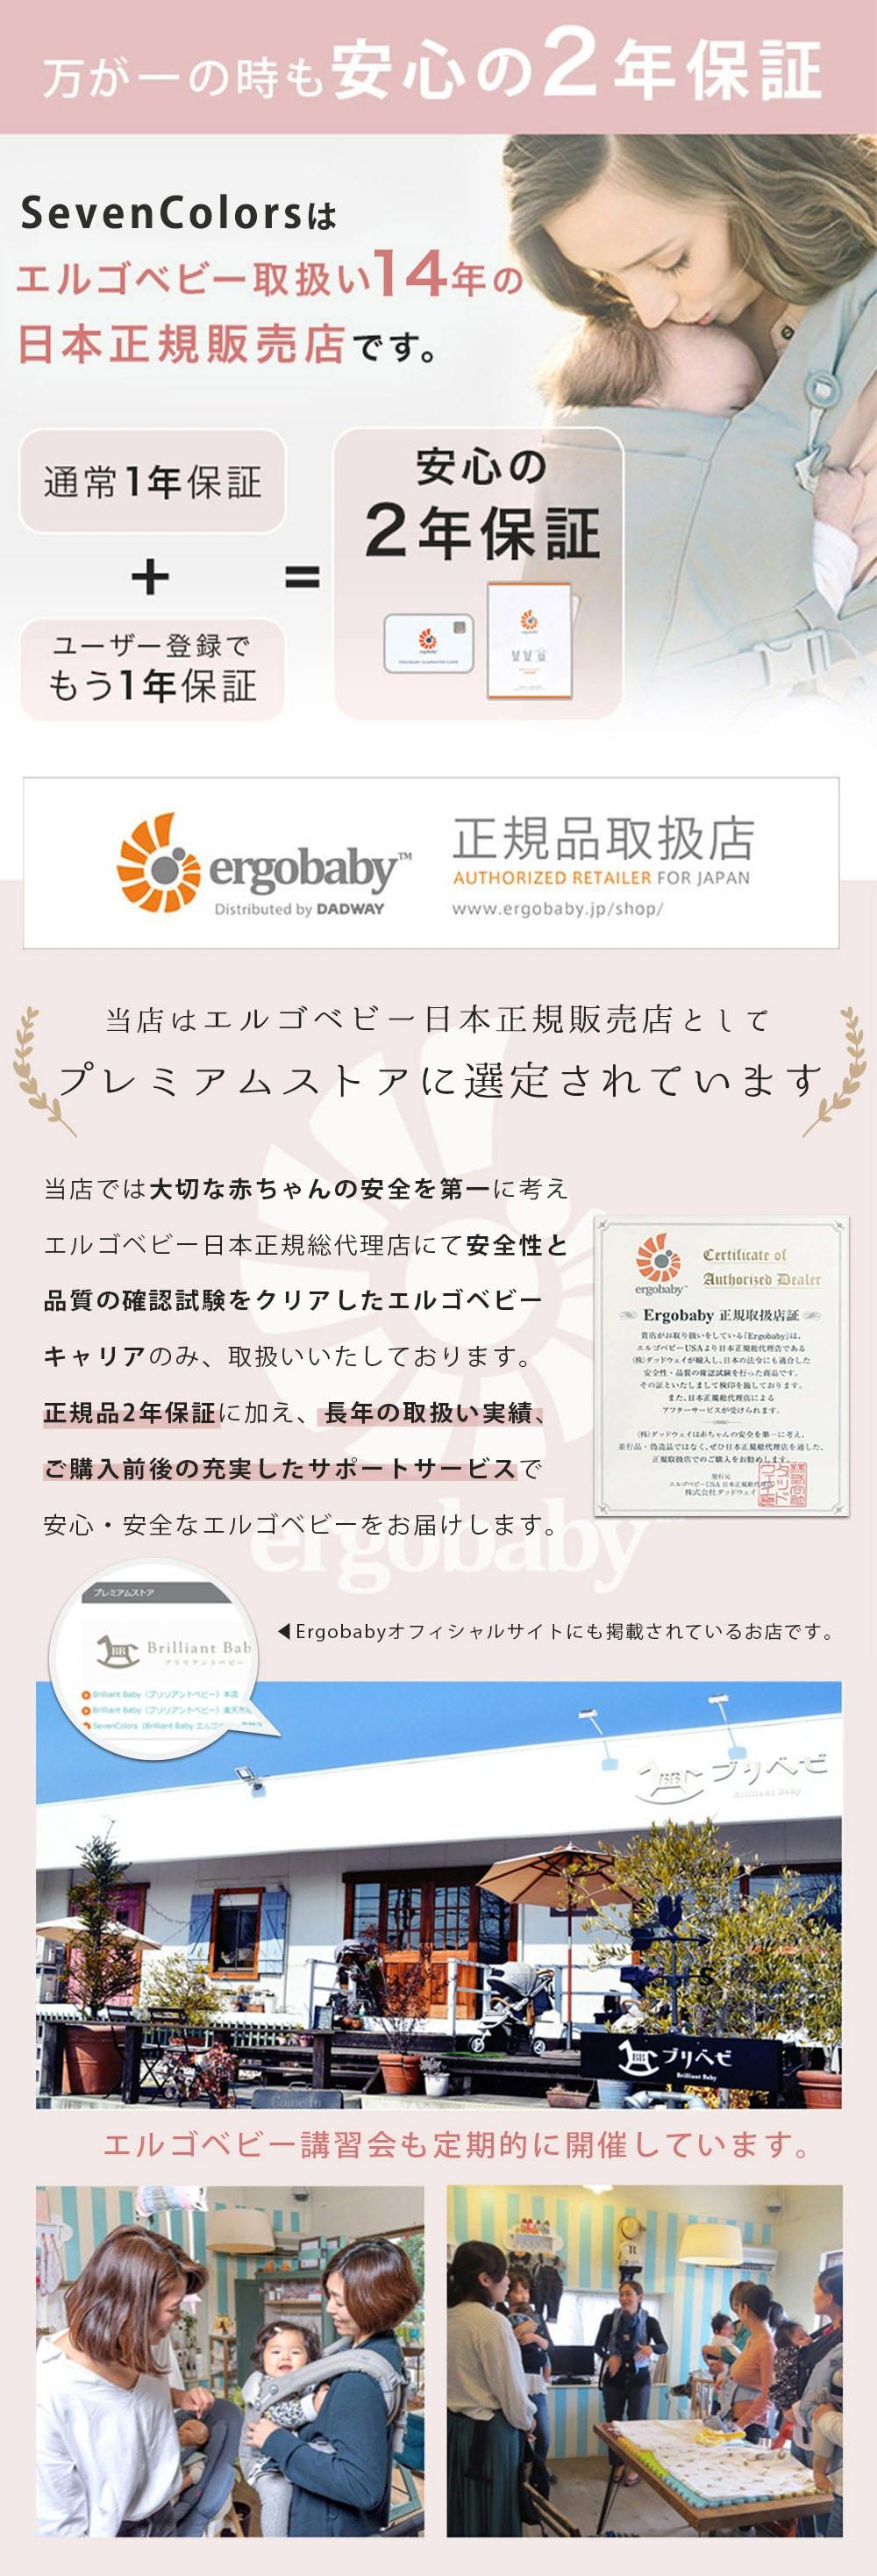 ErgobabyCarrier 正規店2年保証